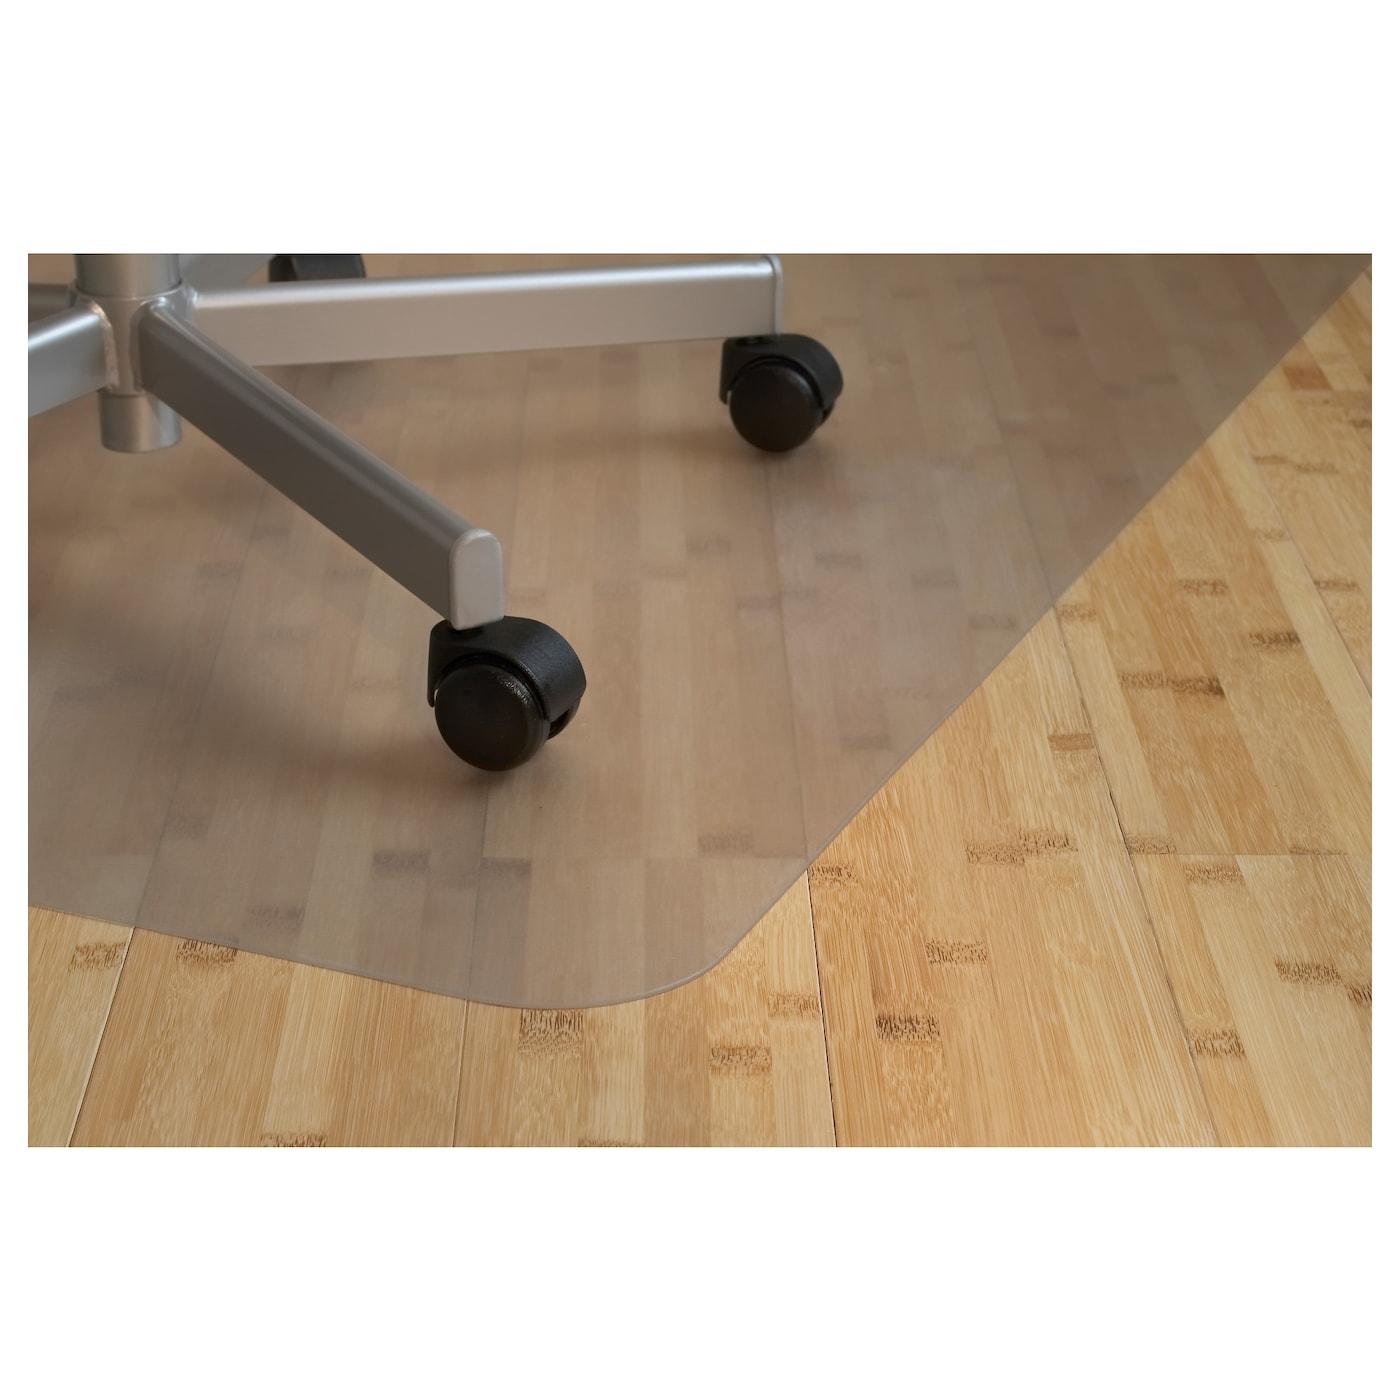 Vloerbescherming Bureaustoel Leenbakker.Kolon Vloerbeschermer 120 X 100 Cm Ikea